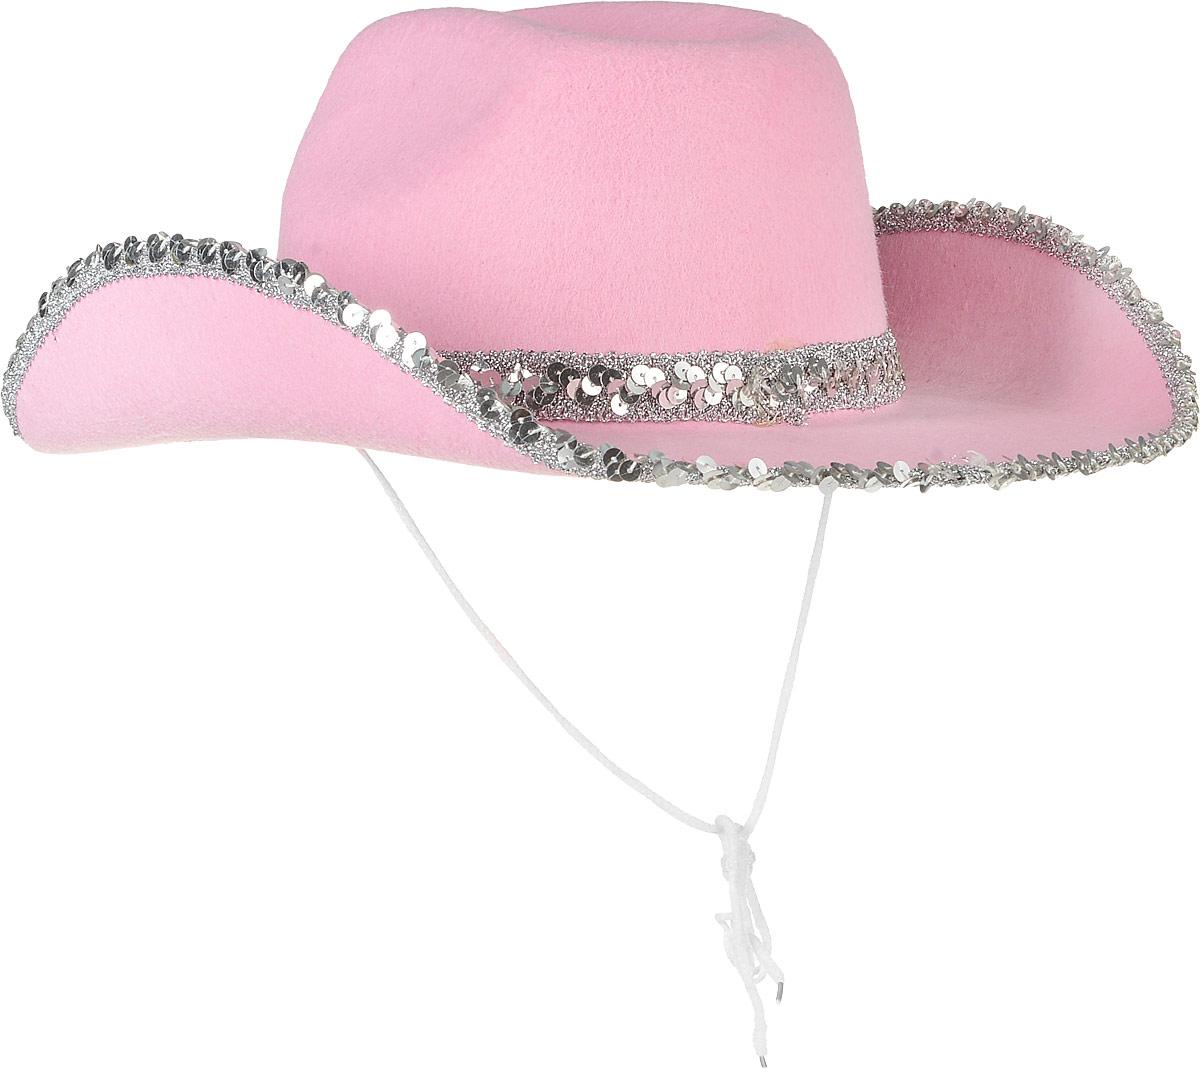 Rio Аксессуар для карнавального костюма Шляпа 8113